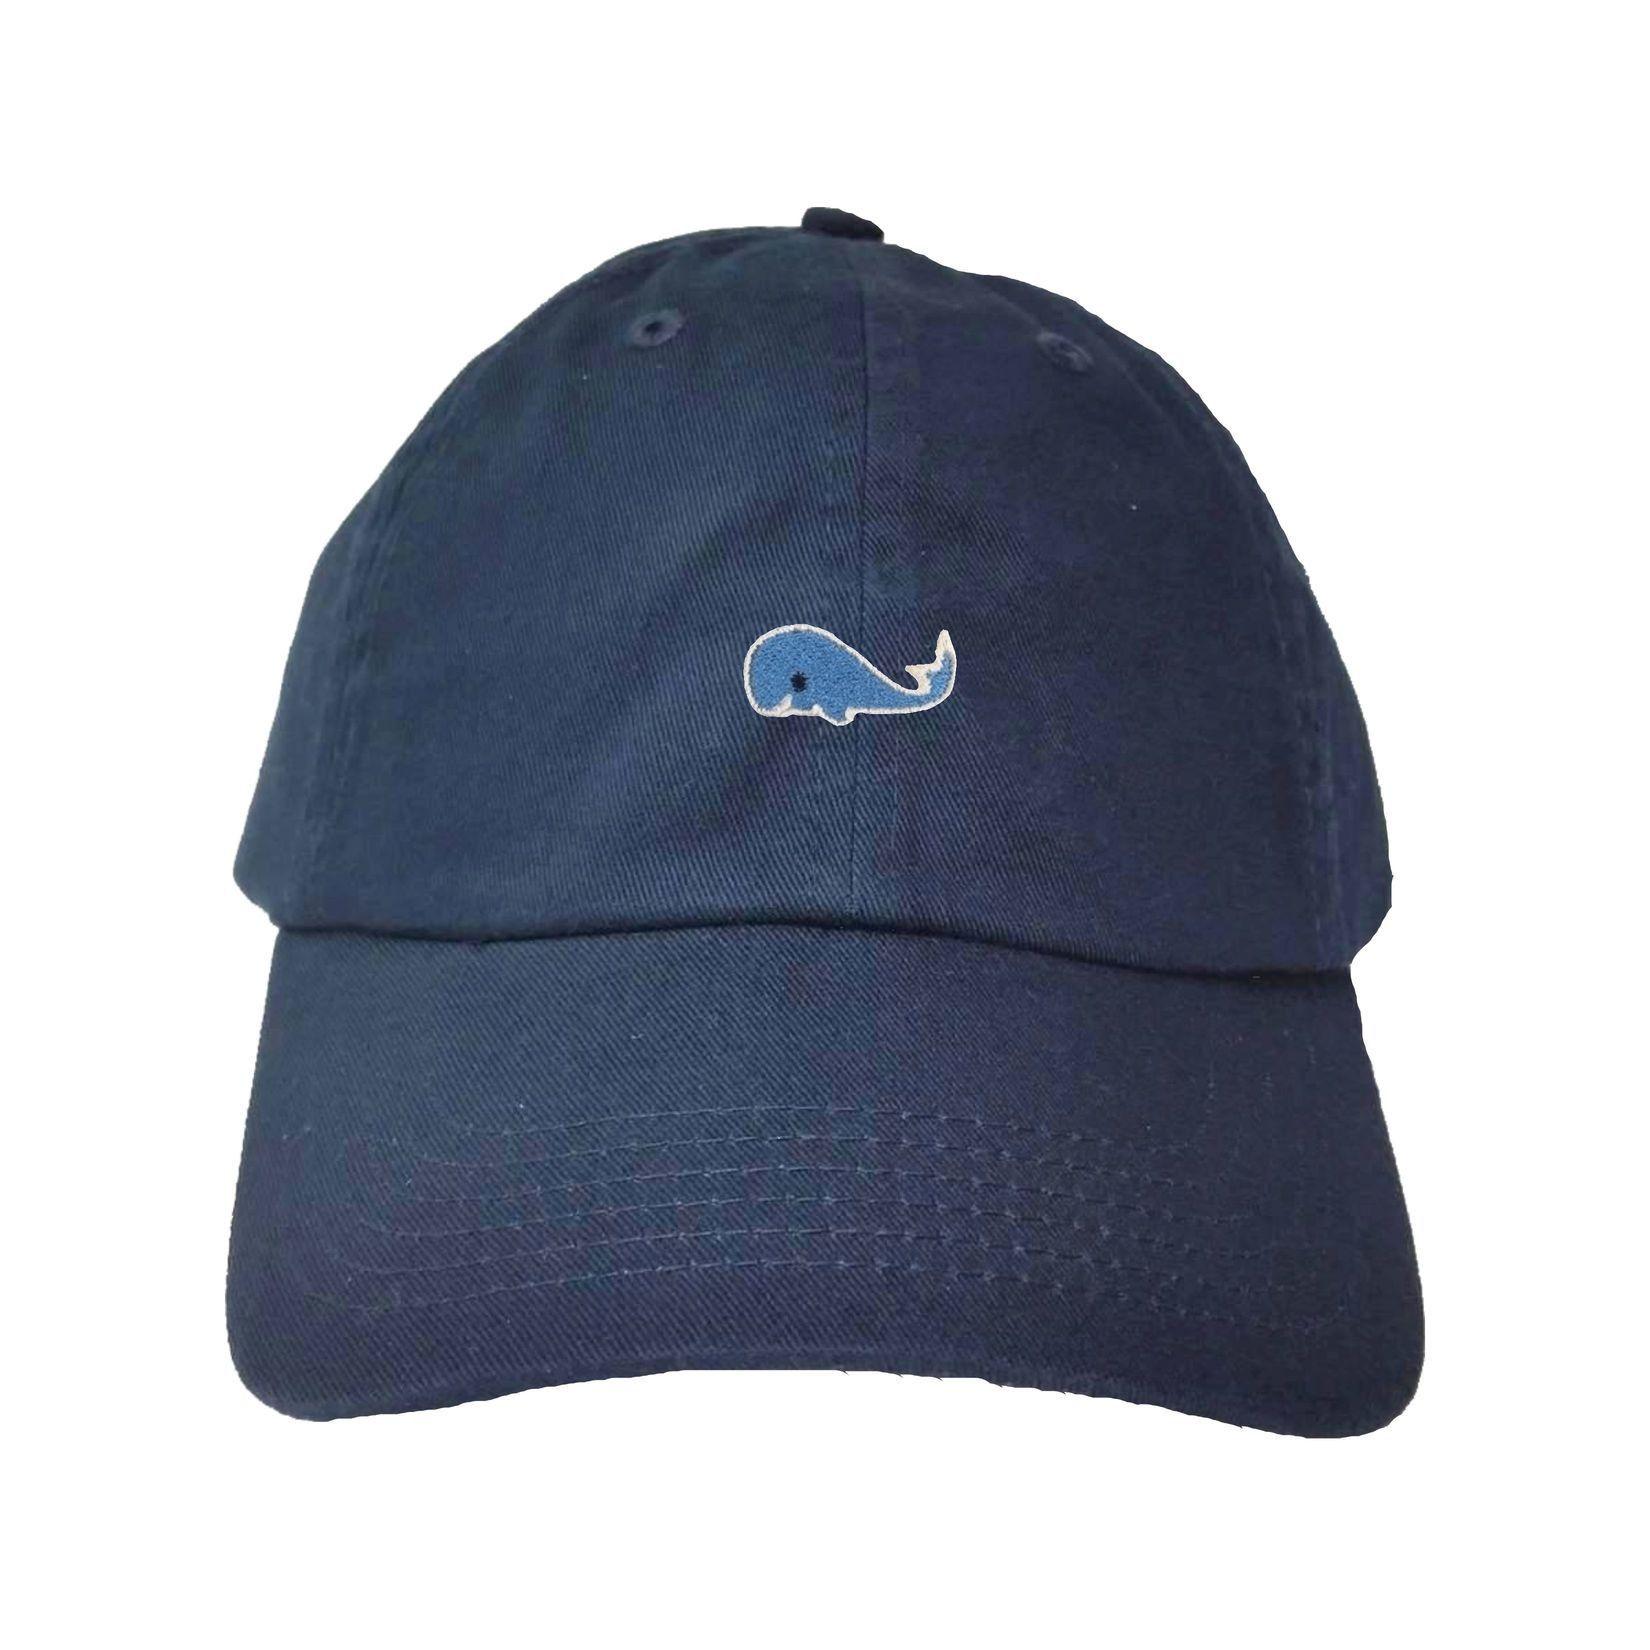 63c0d4c2c51c6 Adult Blue Whale Embroidered Dad Hat Cap